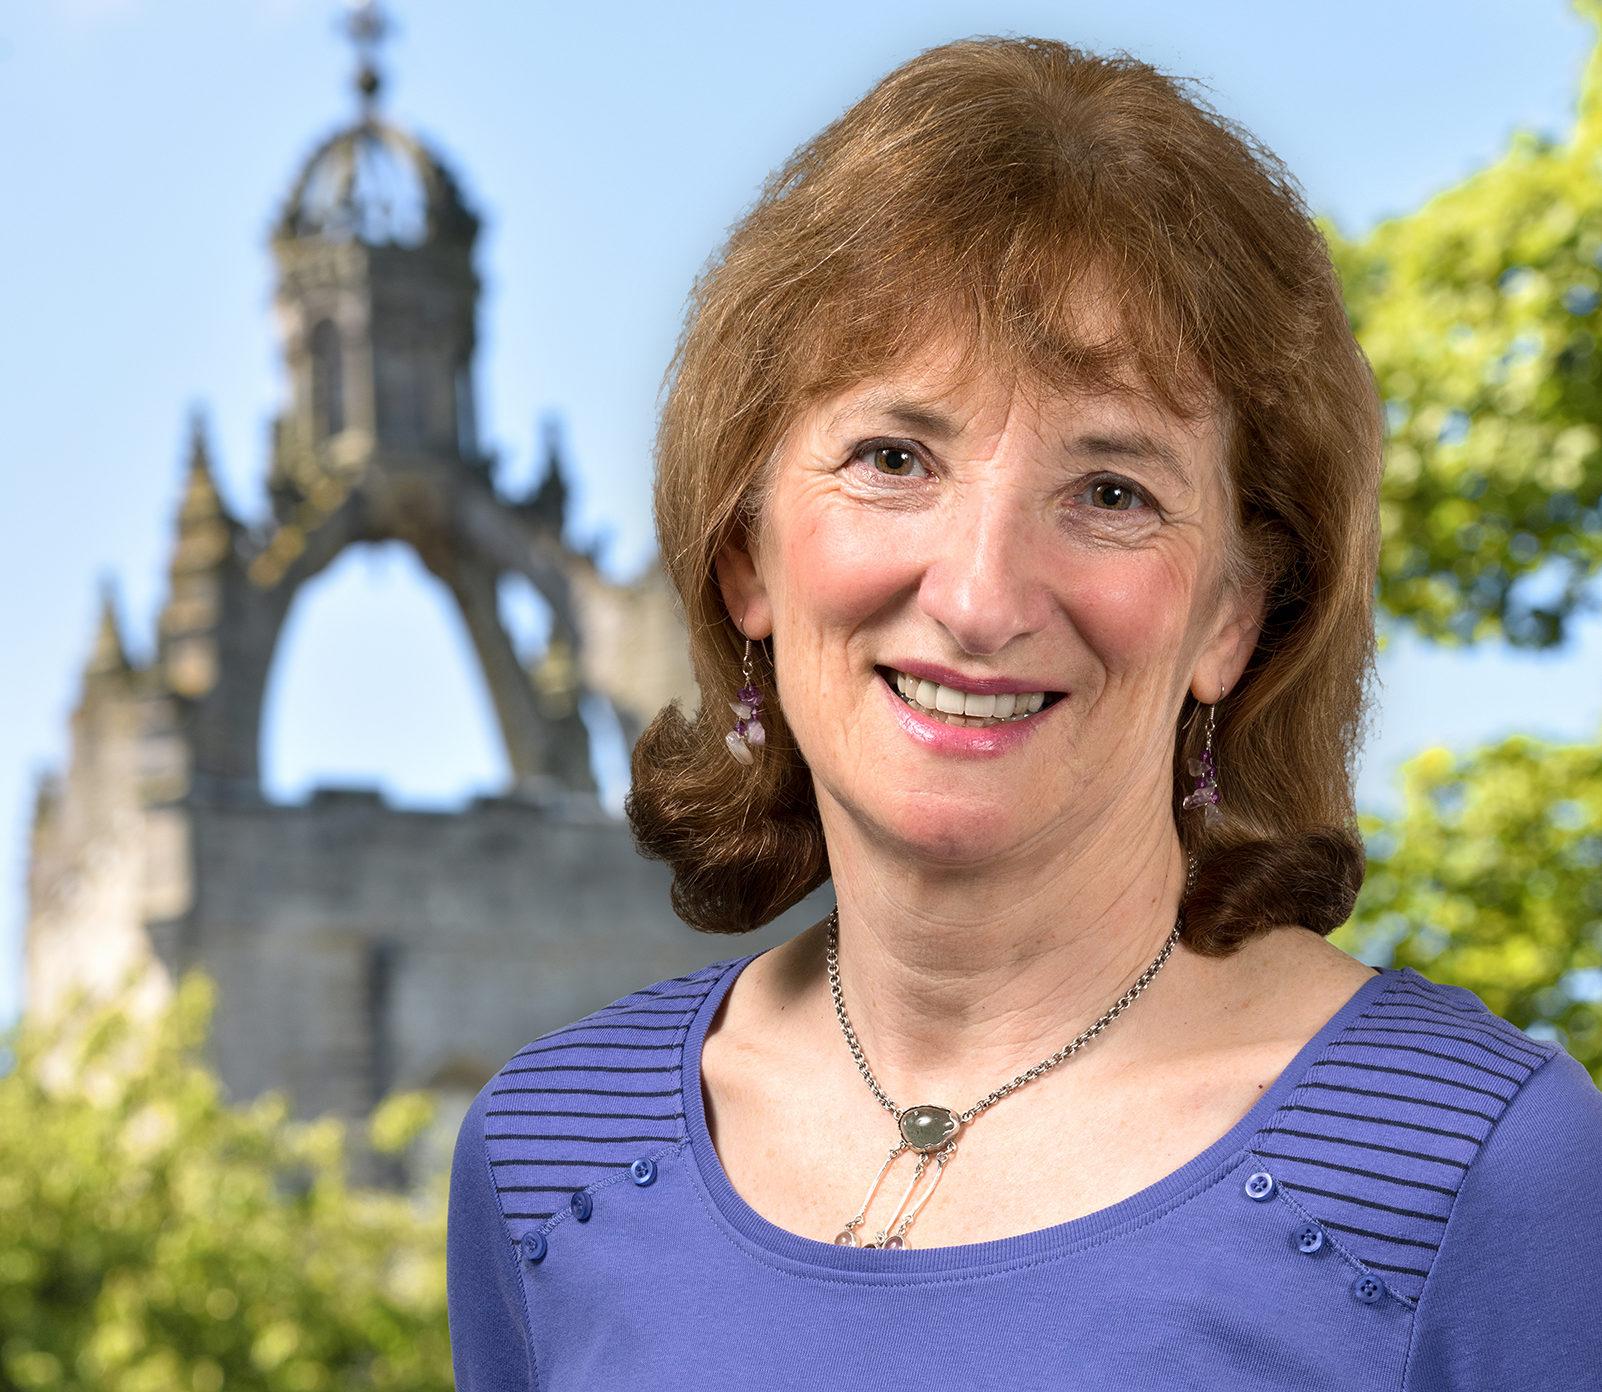 An Aberdeen professor has created a Scottish Diaspora database